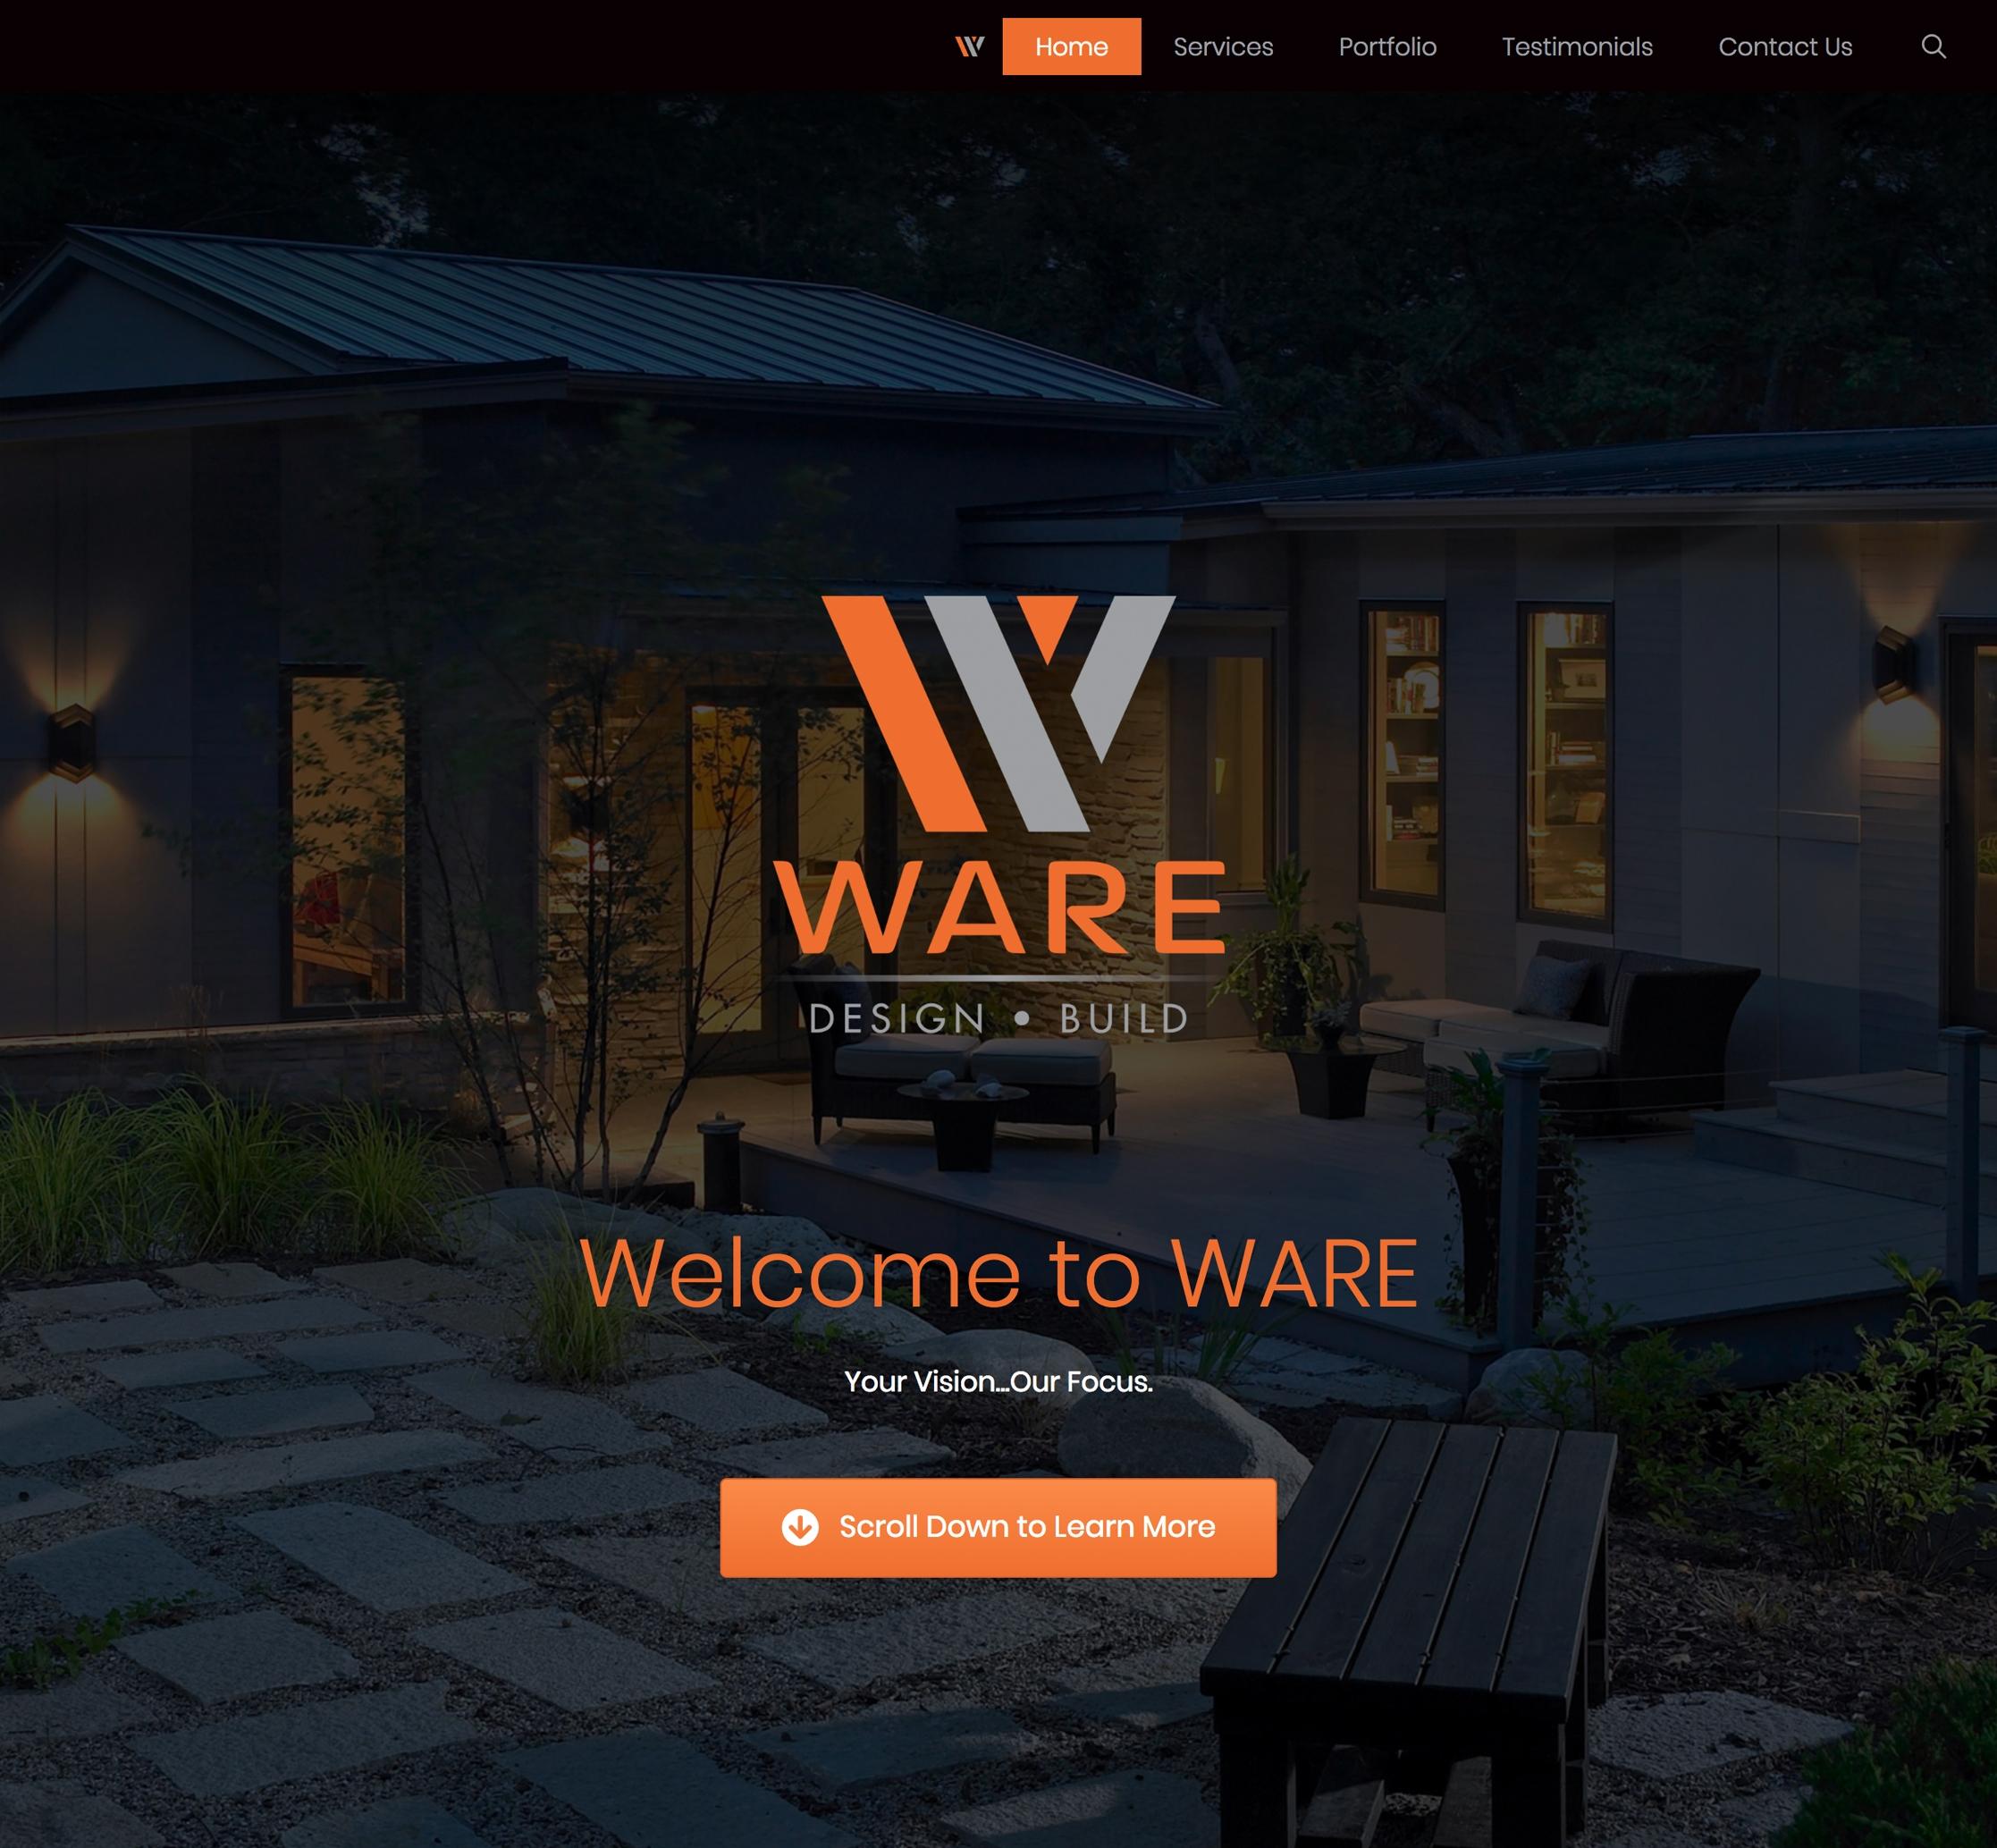 Ware Design & Build